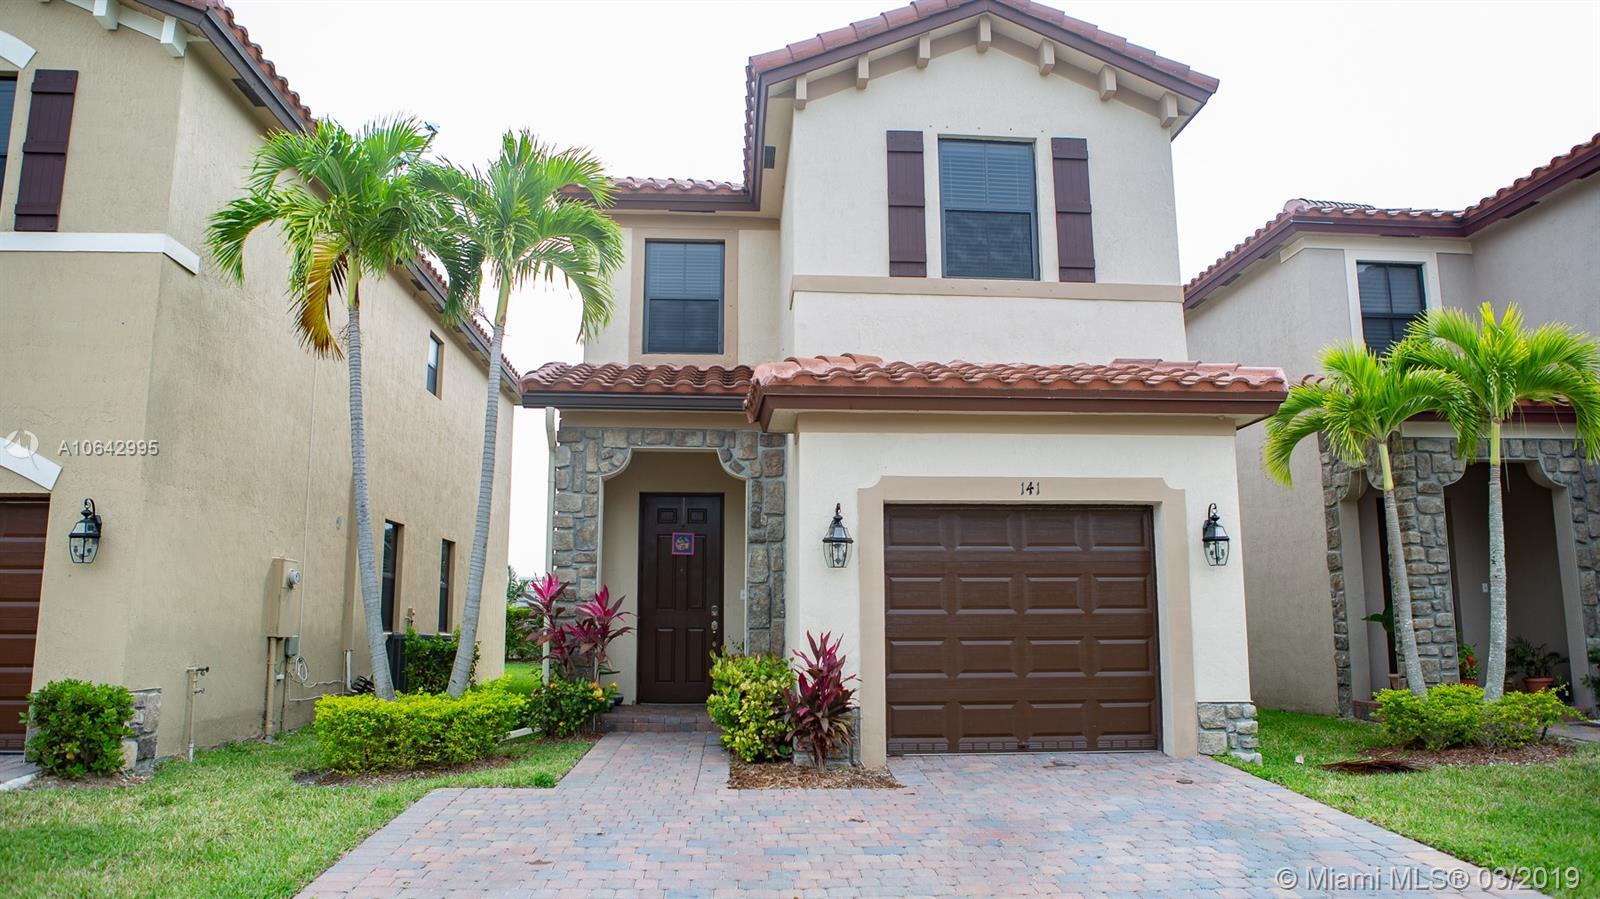 141 NE 37th Pl, Homestead, FL 33033 - Homestead, FL real estate listing